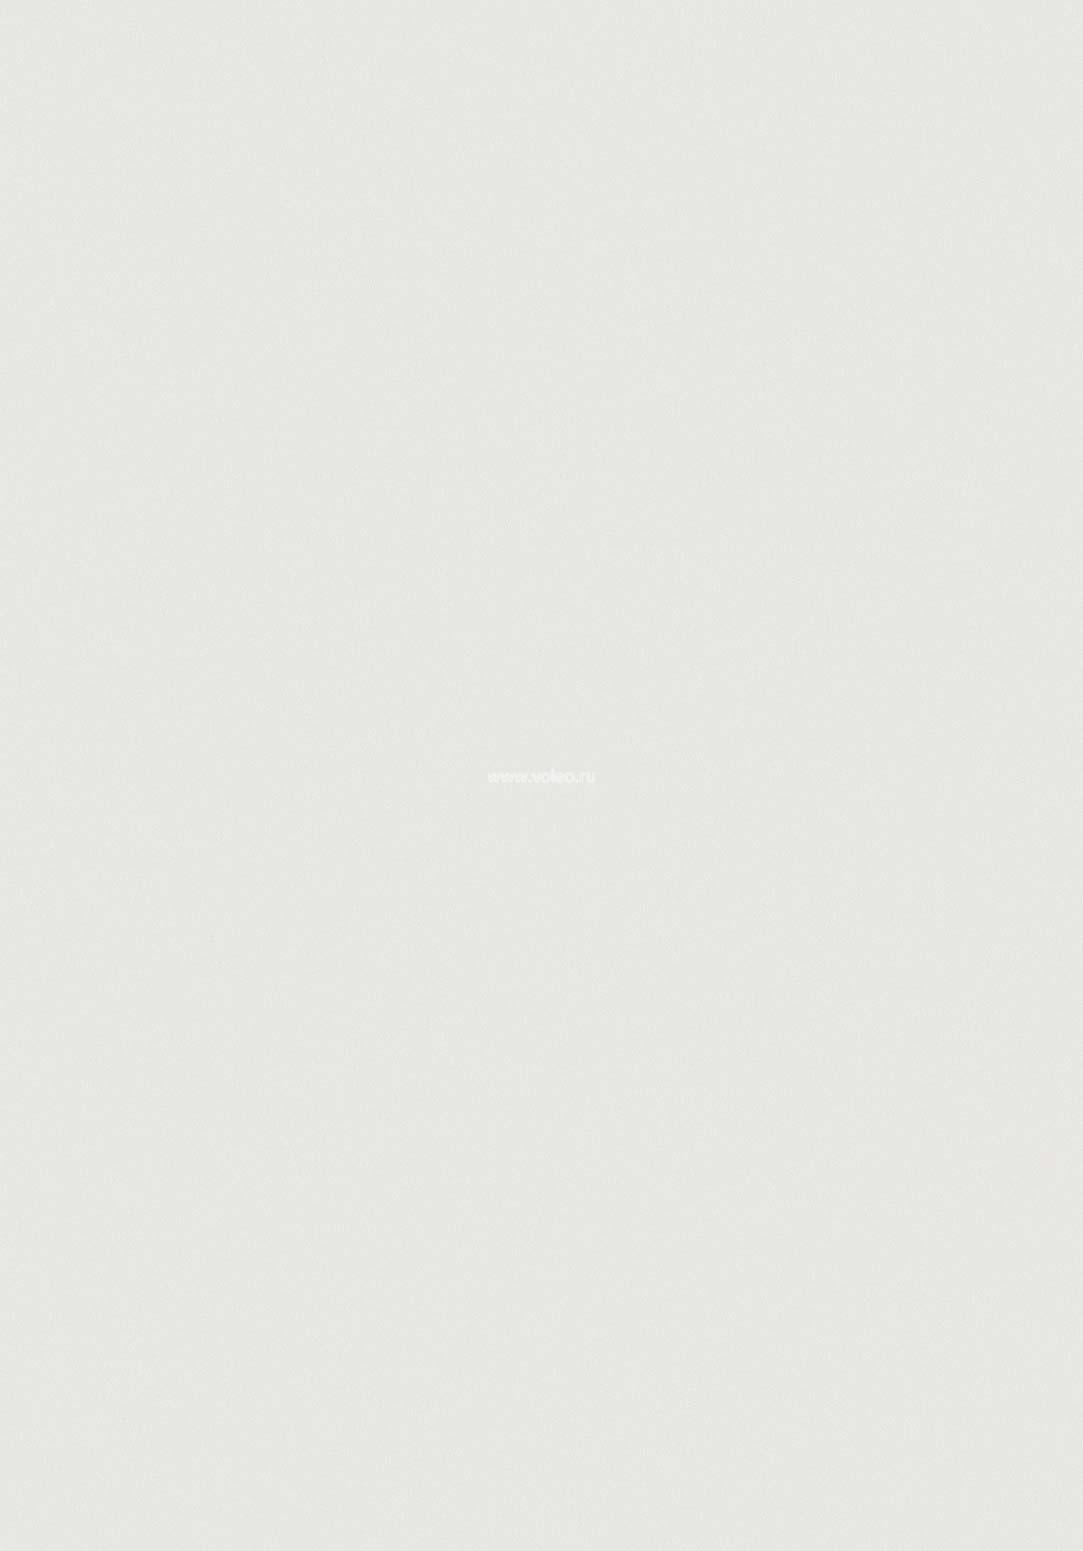 Обои Cole & Son Frontier 89/12047, интернет магазин Волео